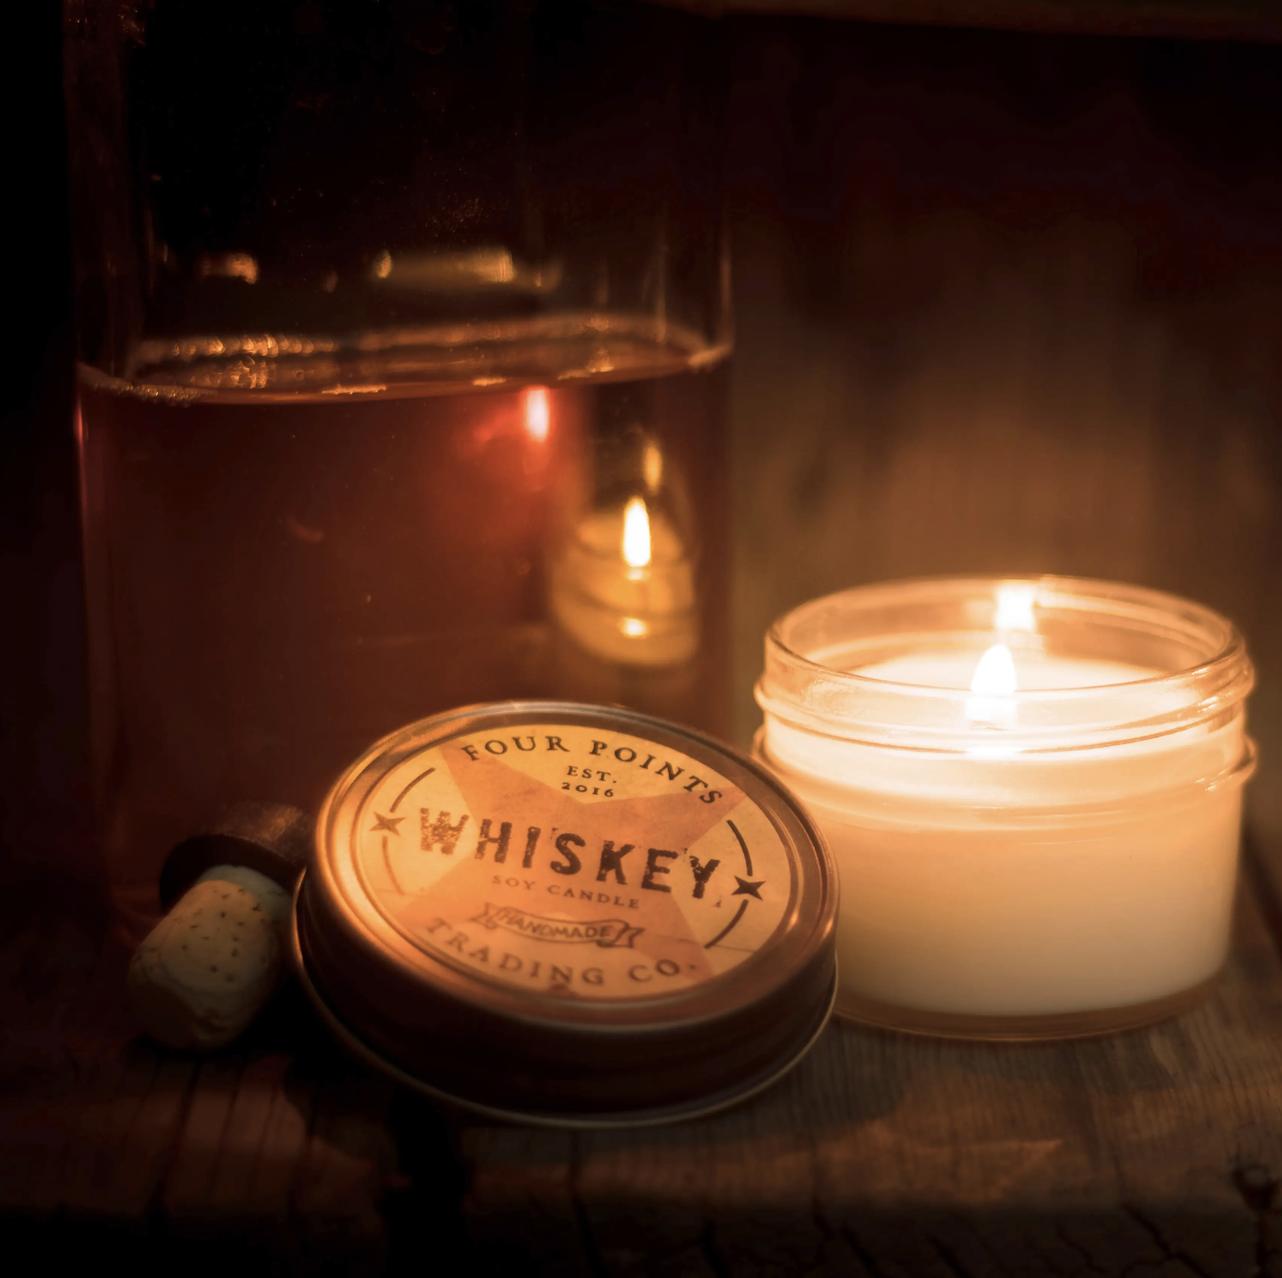 Whiskey, 4oz Soy Candle